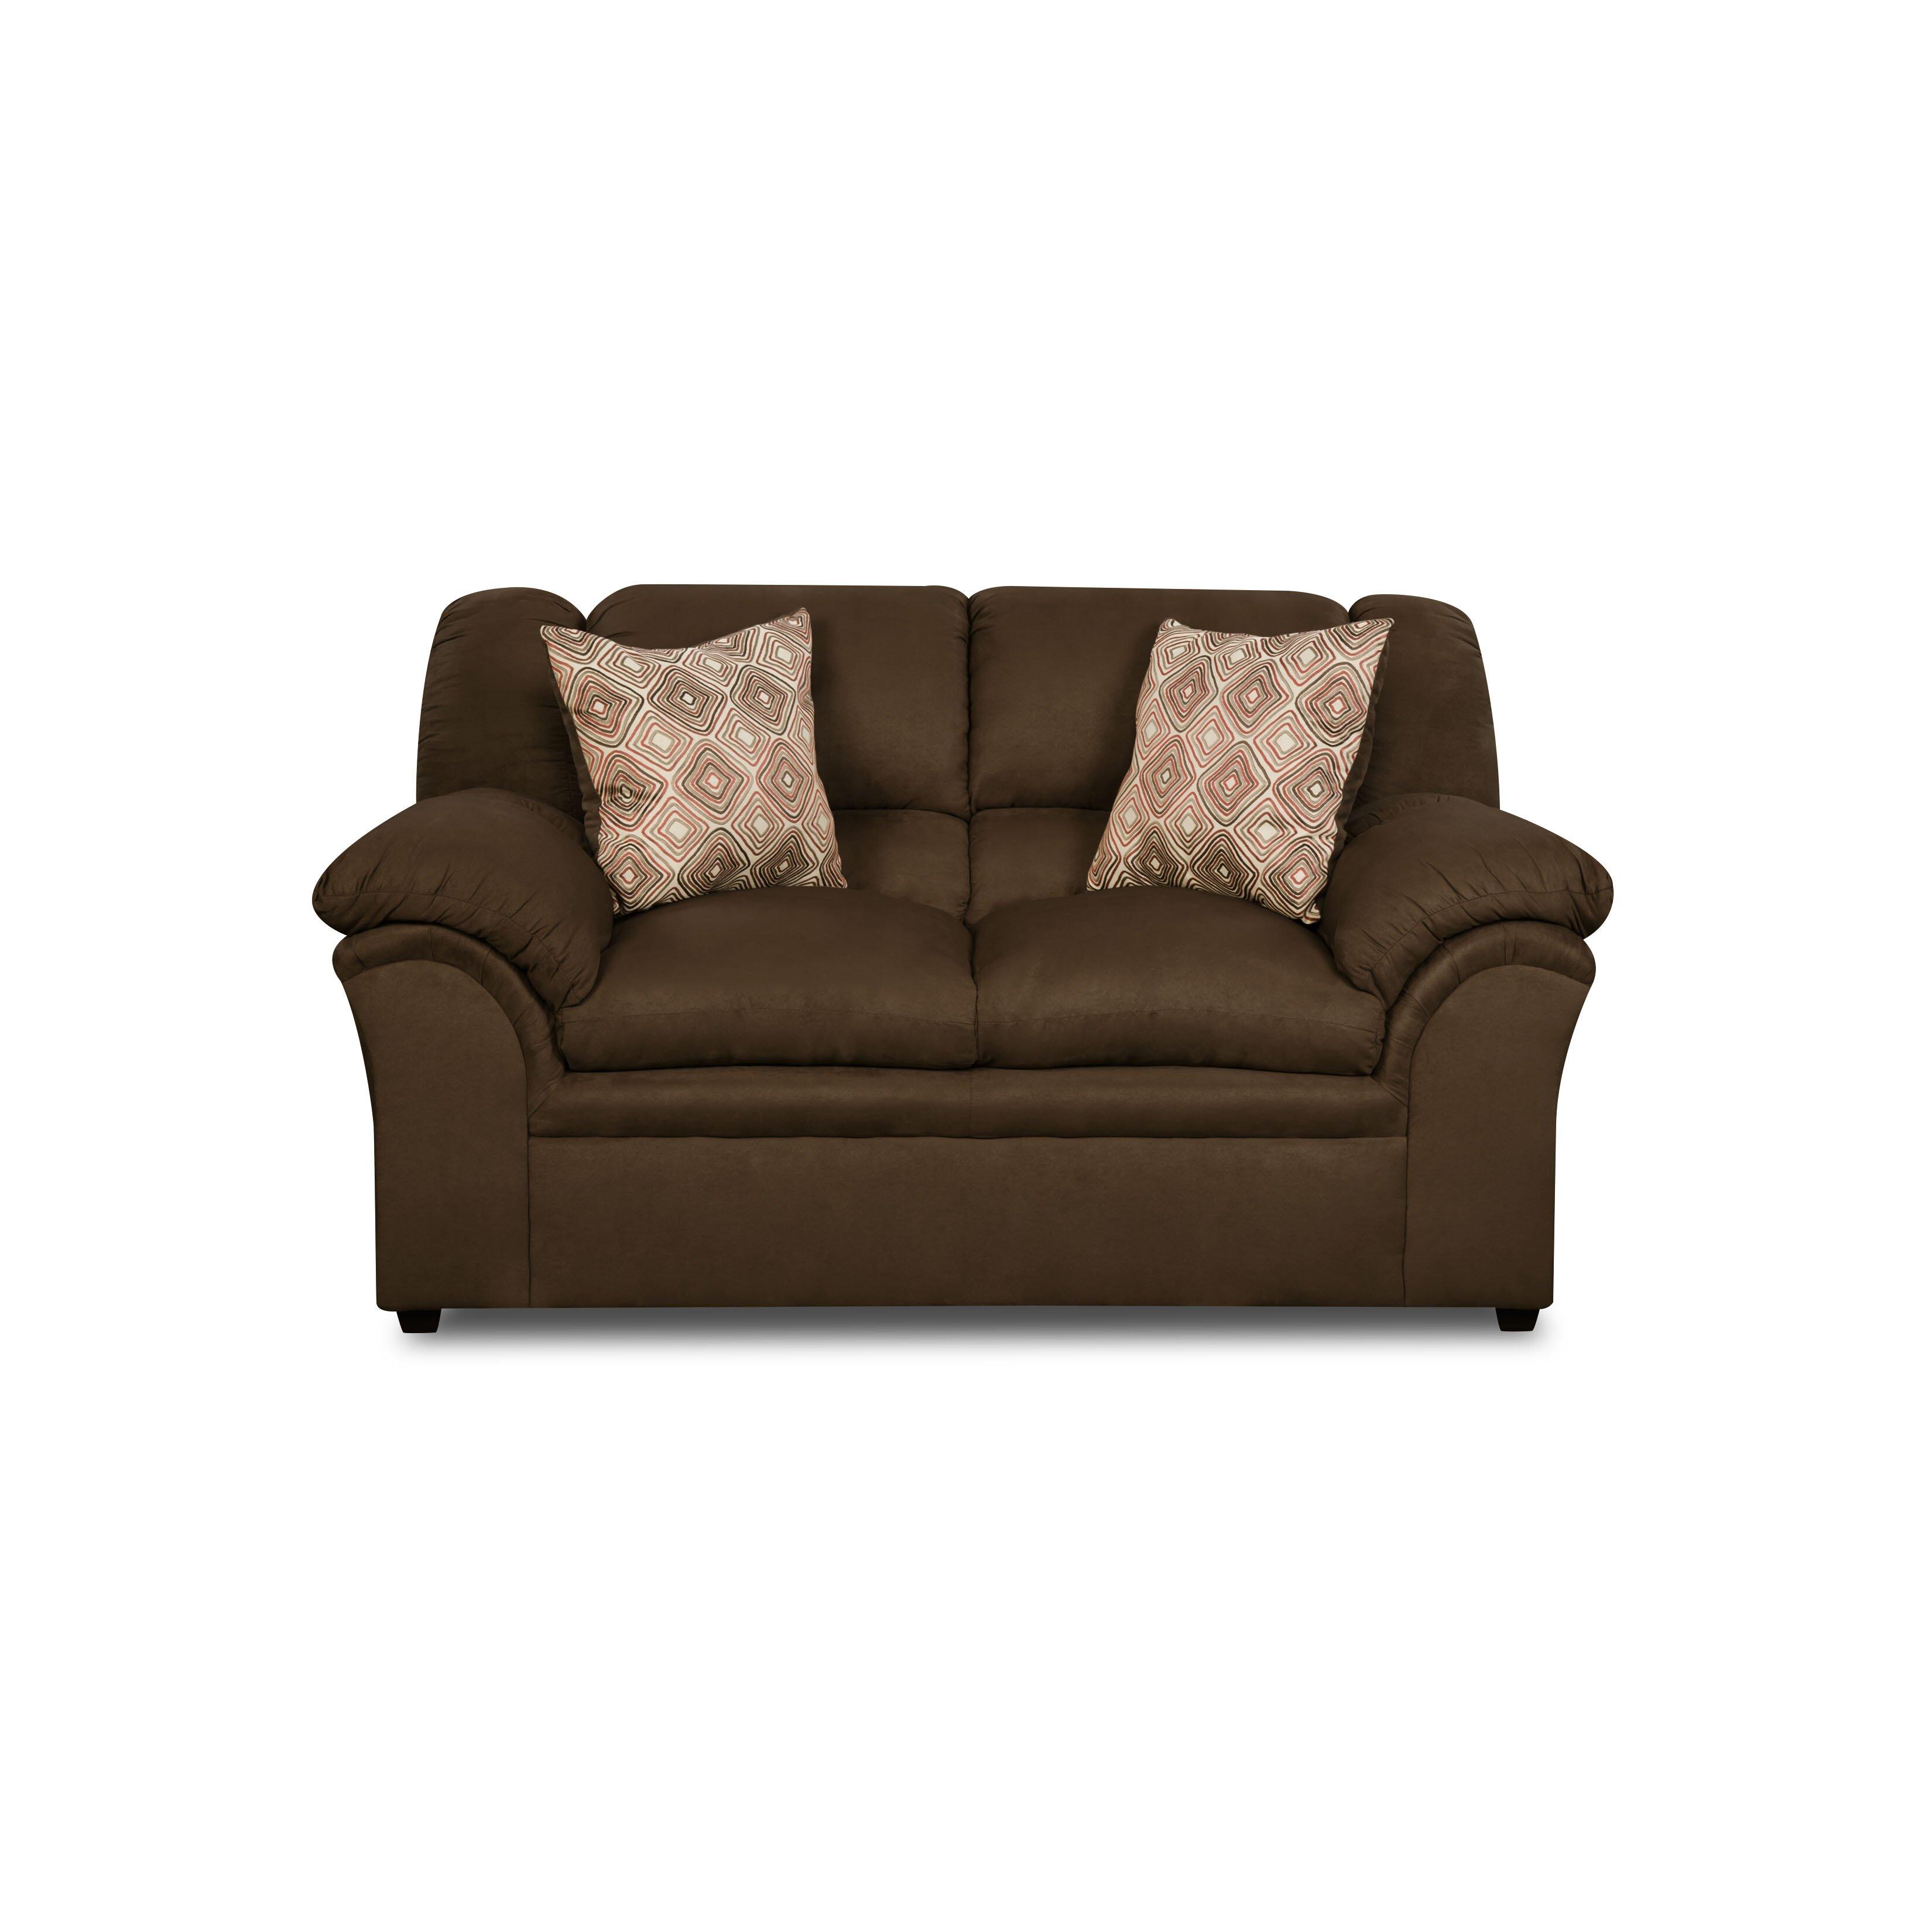 Simmons Upholstery Venture Loveseat Reviews Wayfair